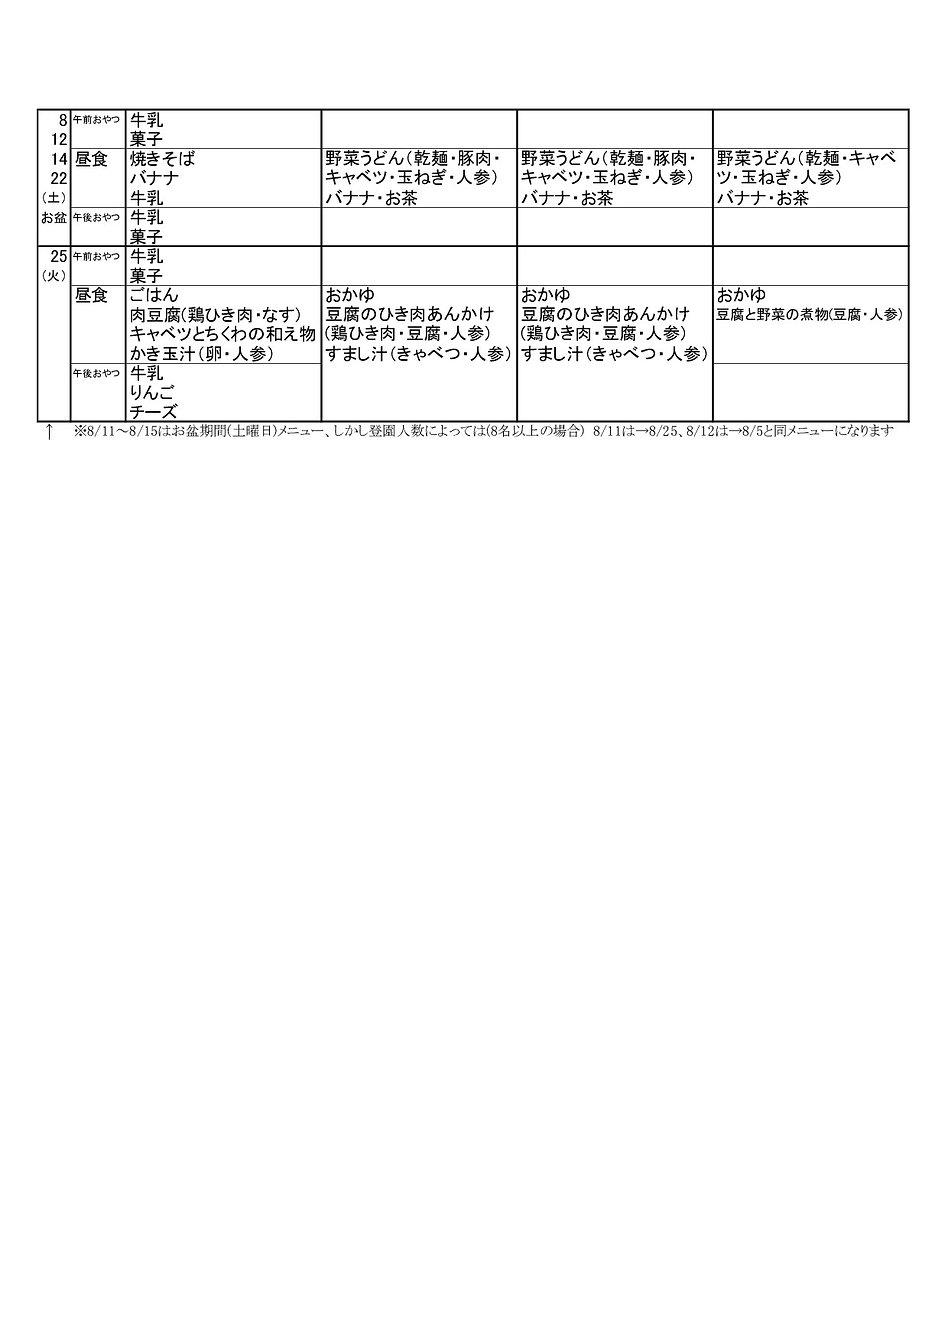 2020.8髮「荵ウ鬟溽鍵遶玖。ィ_002.jpg